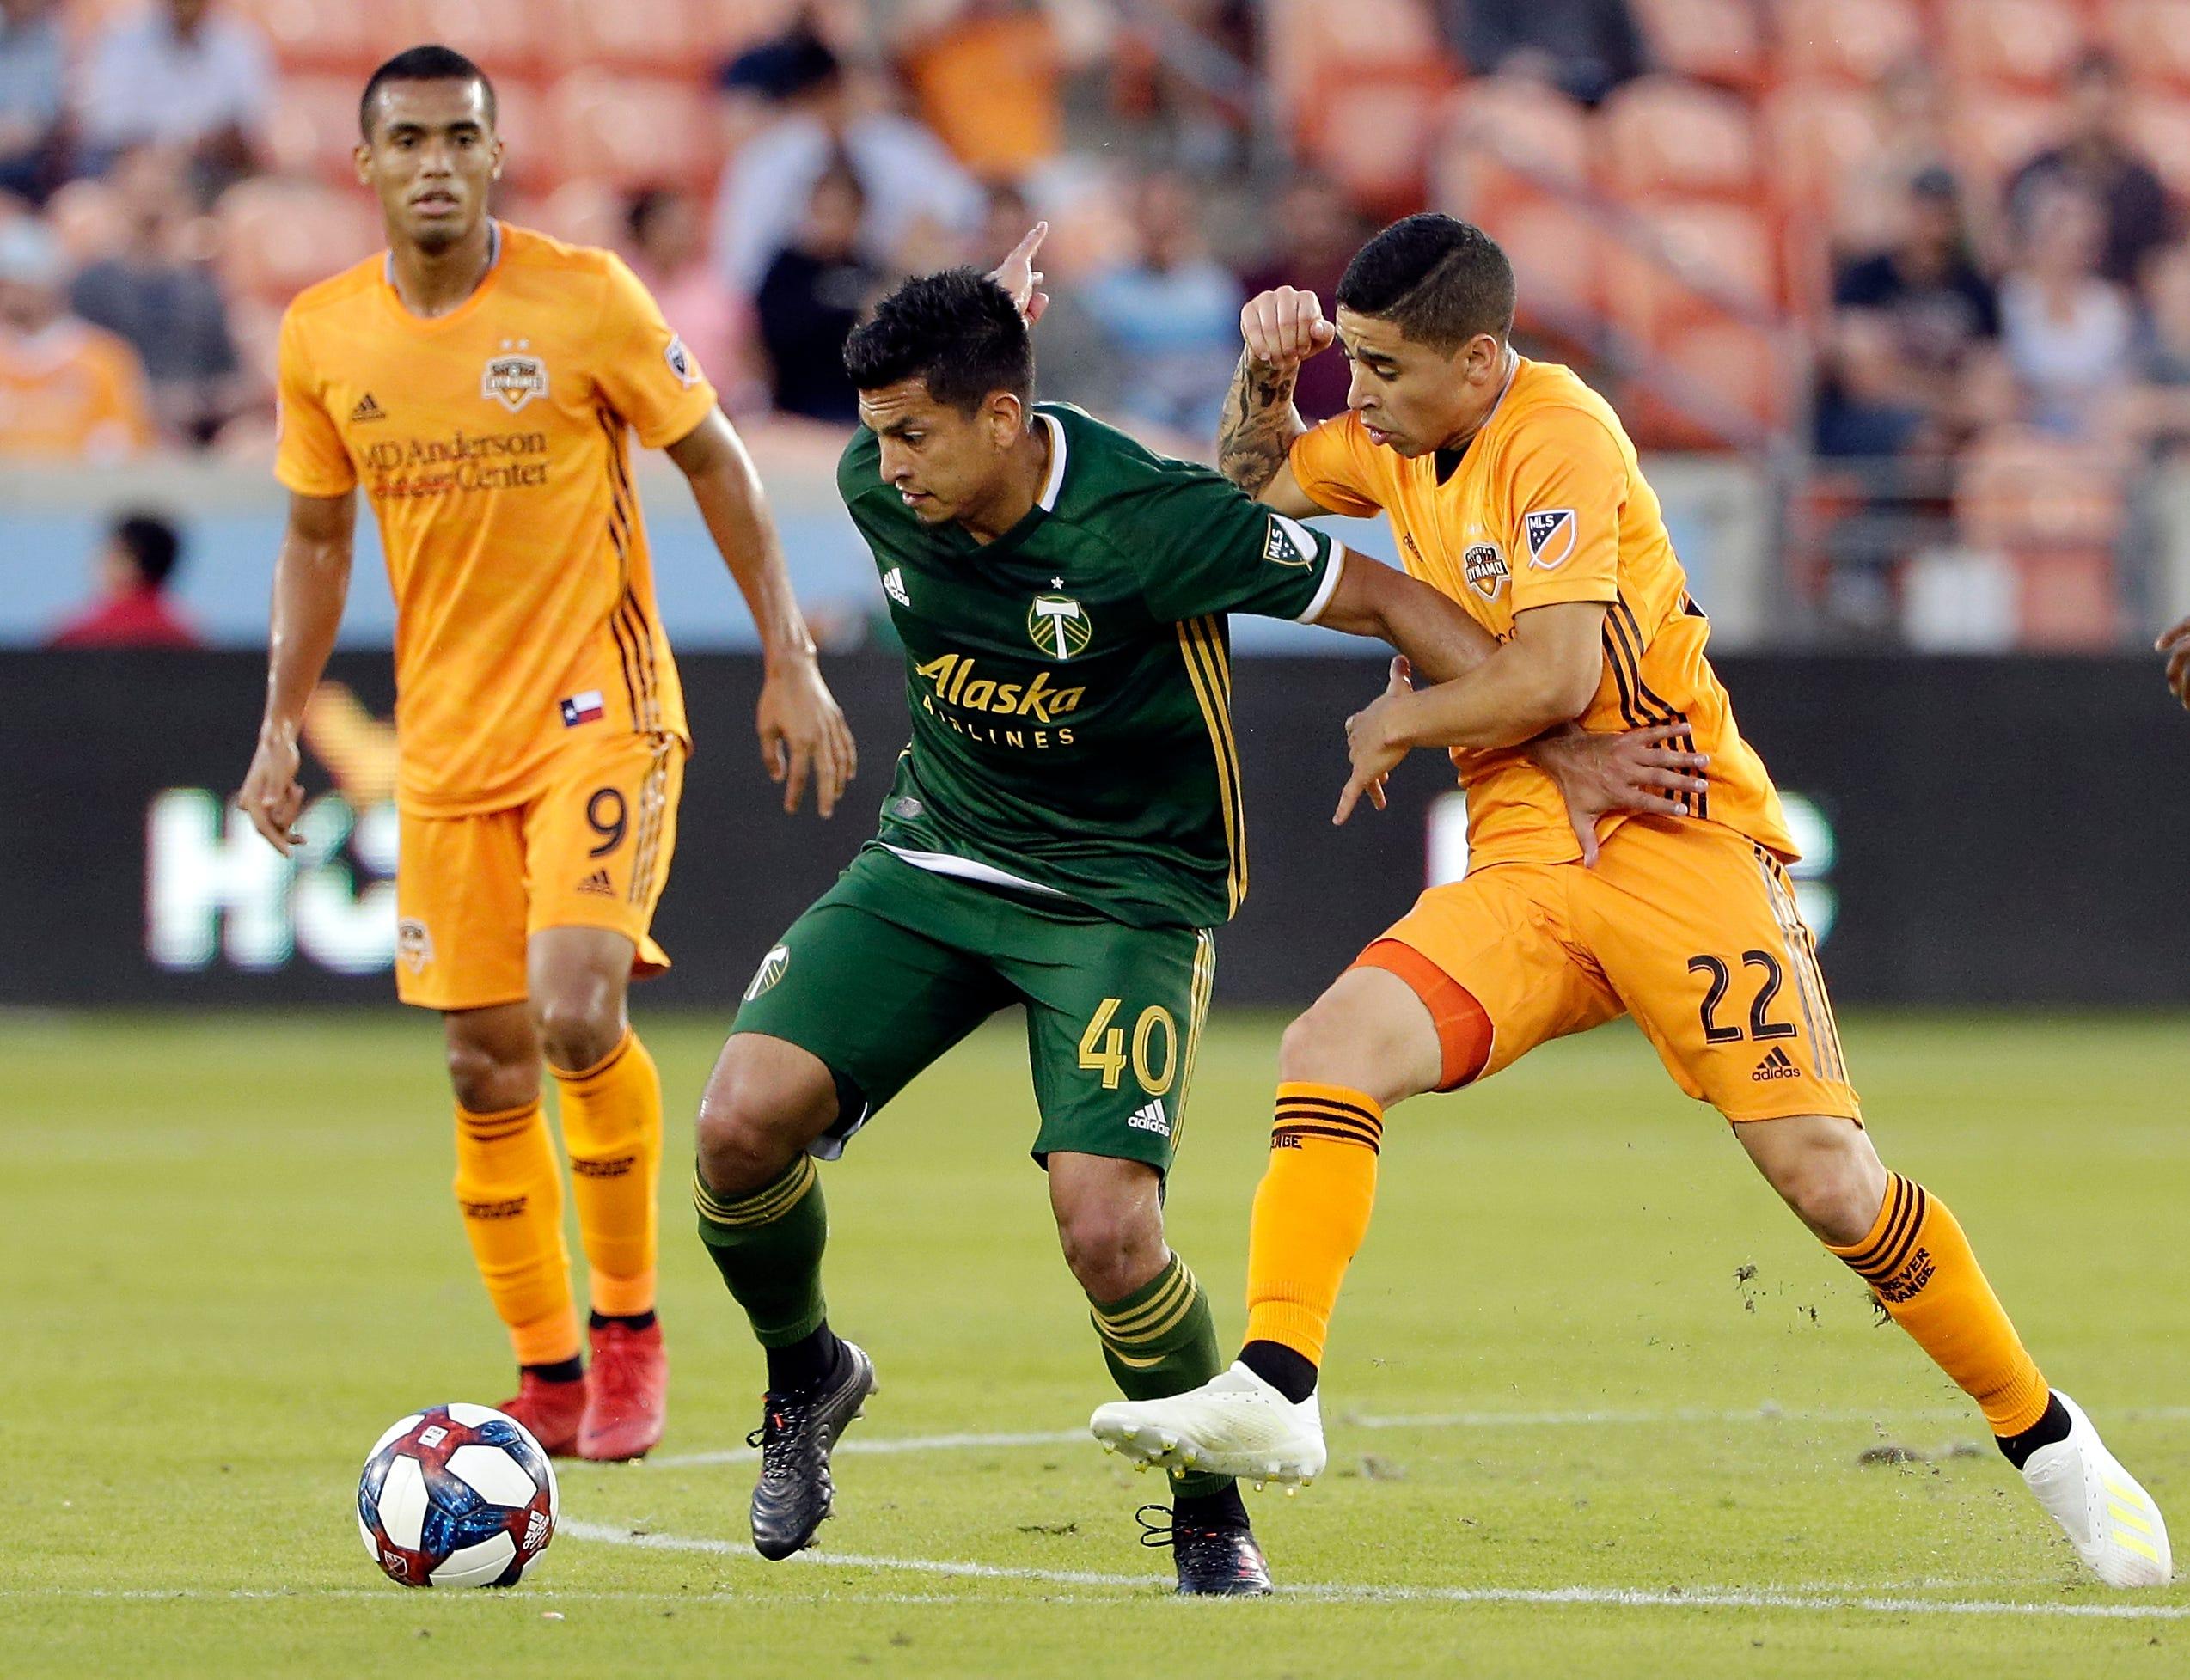 Fernández scores in MLS debut, Timbers tie Dynamo 1-1